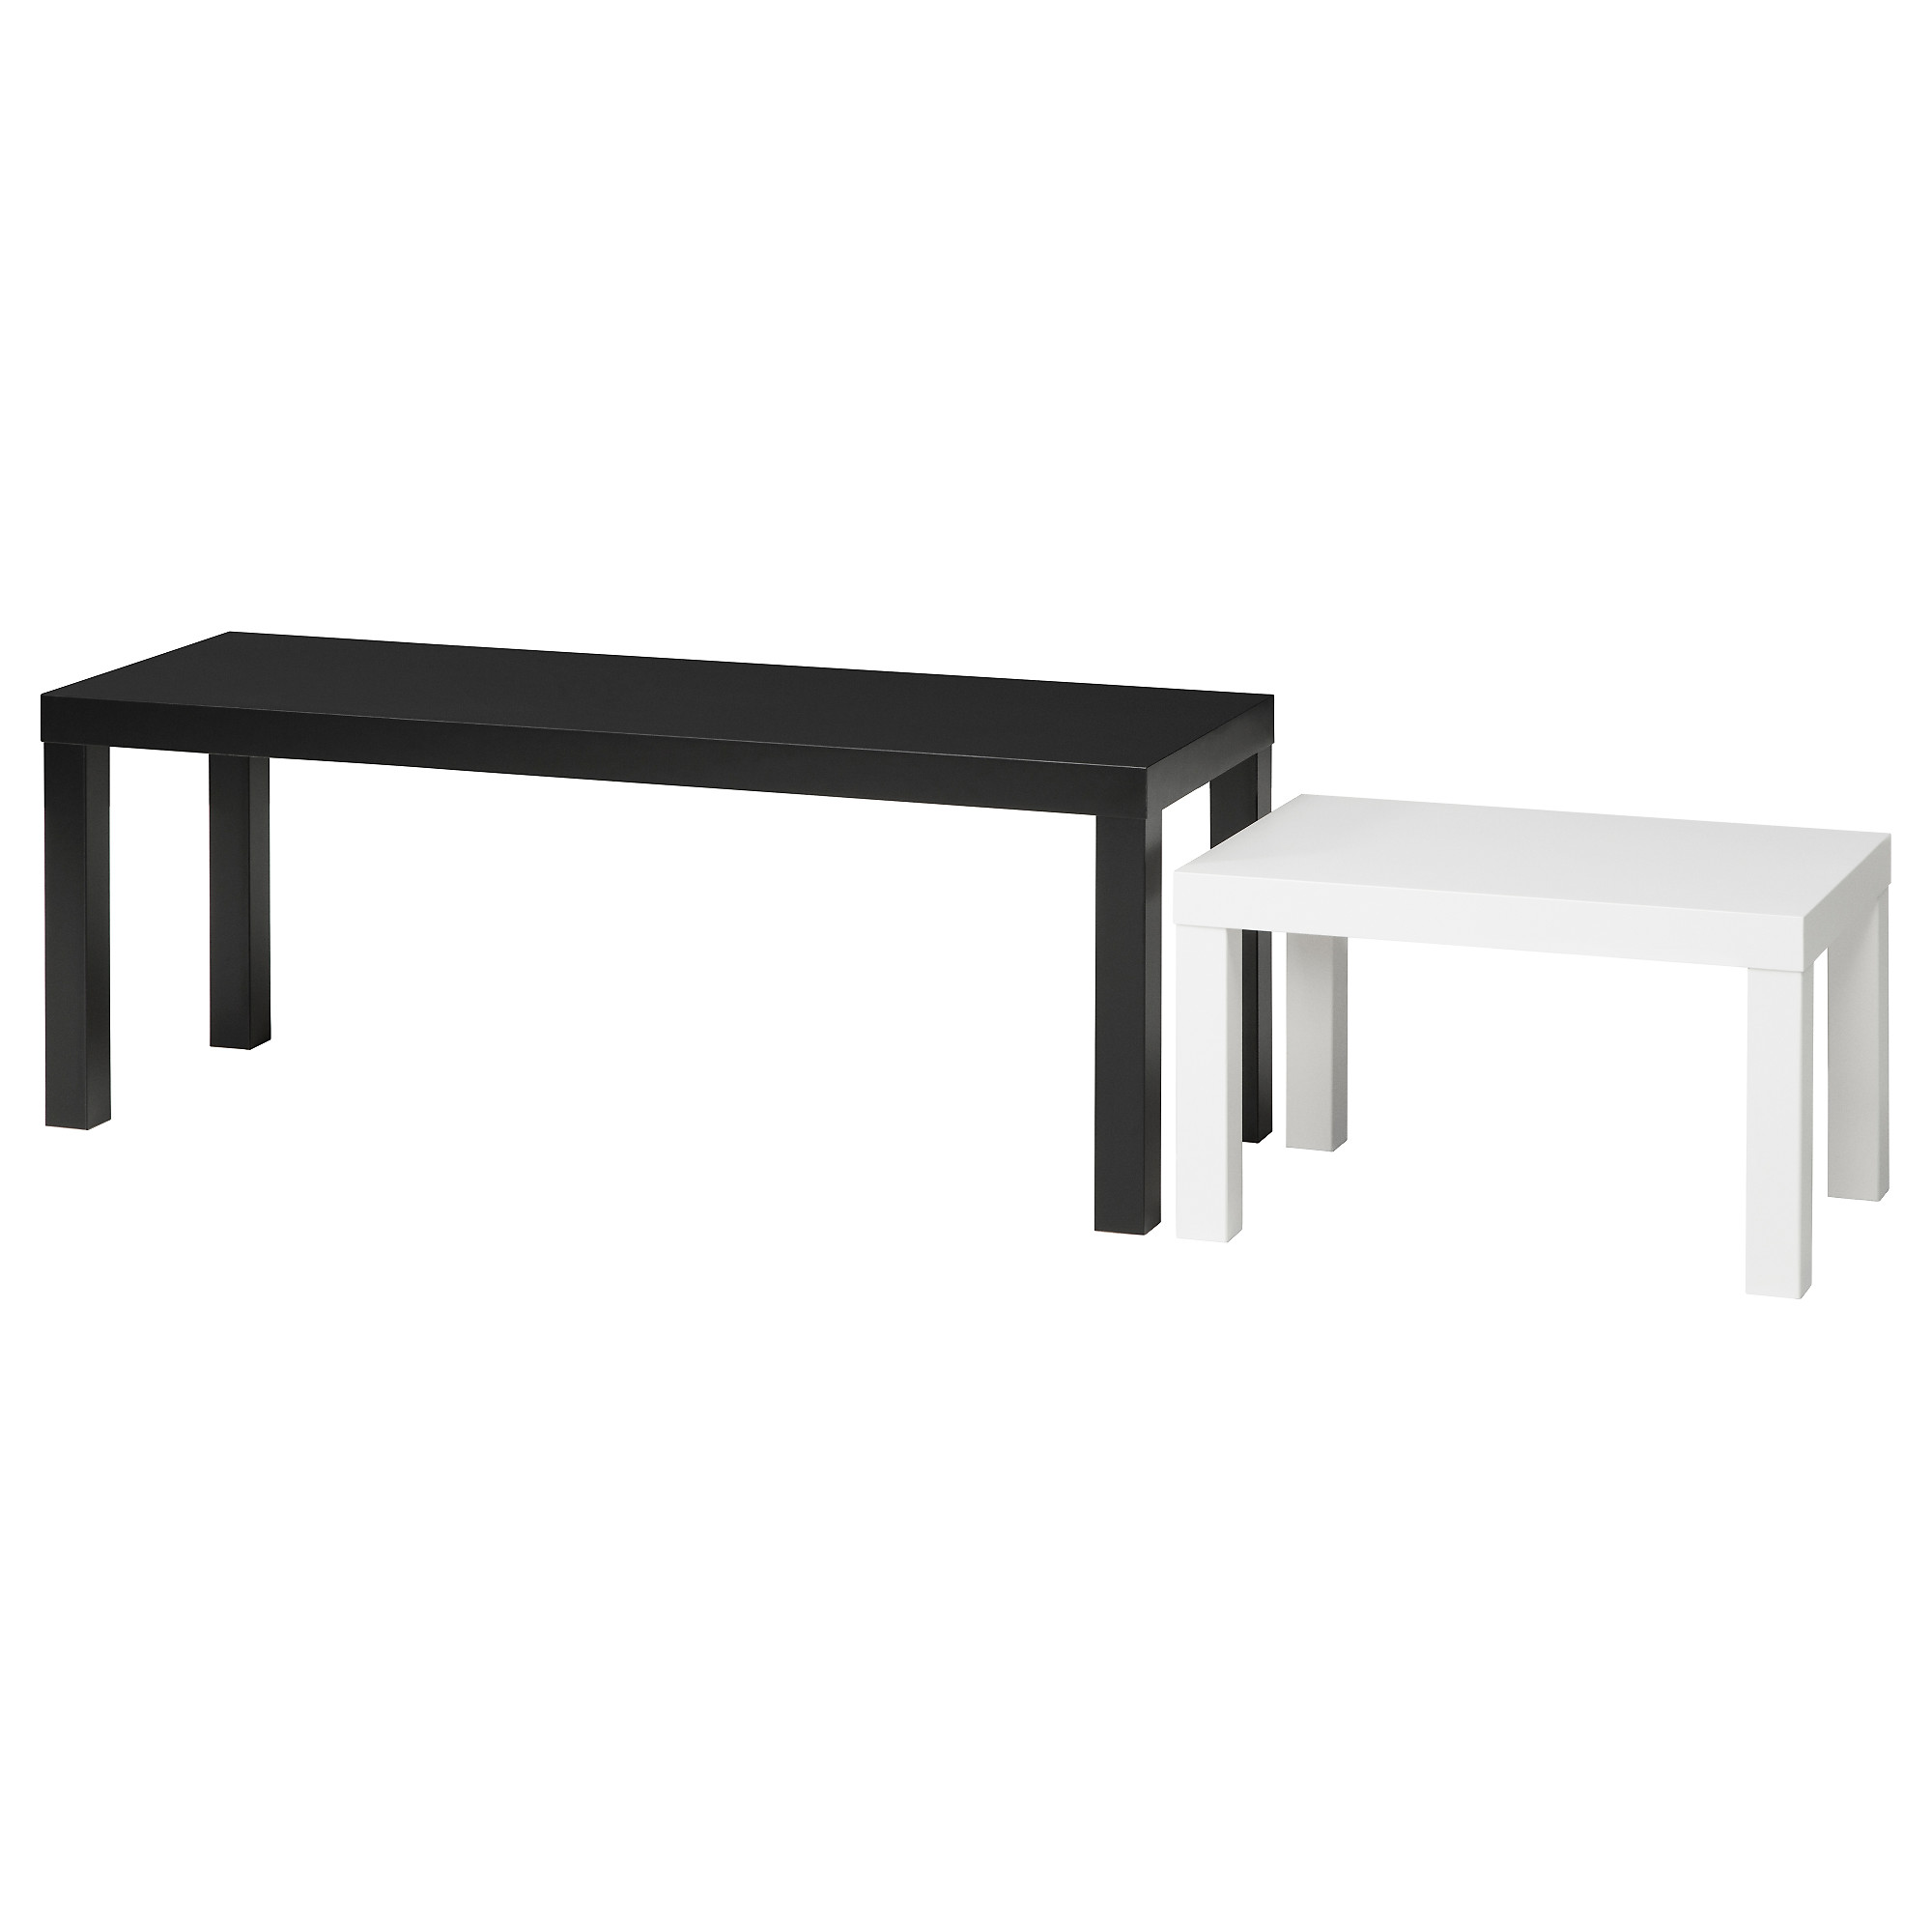 ikea latvia shop for furniture lighting home accessories more rh ikea lv black sofa table walmart black sofa table with stools